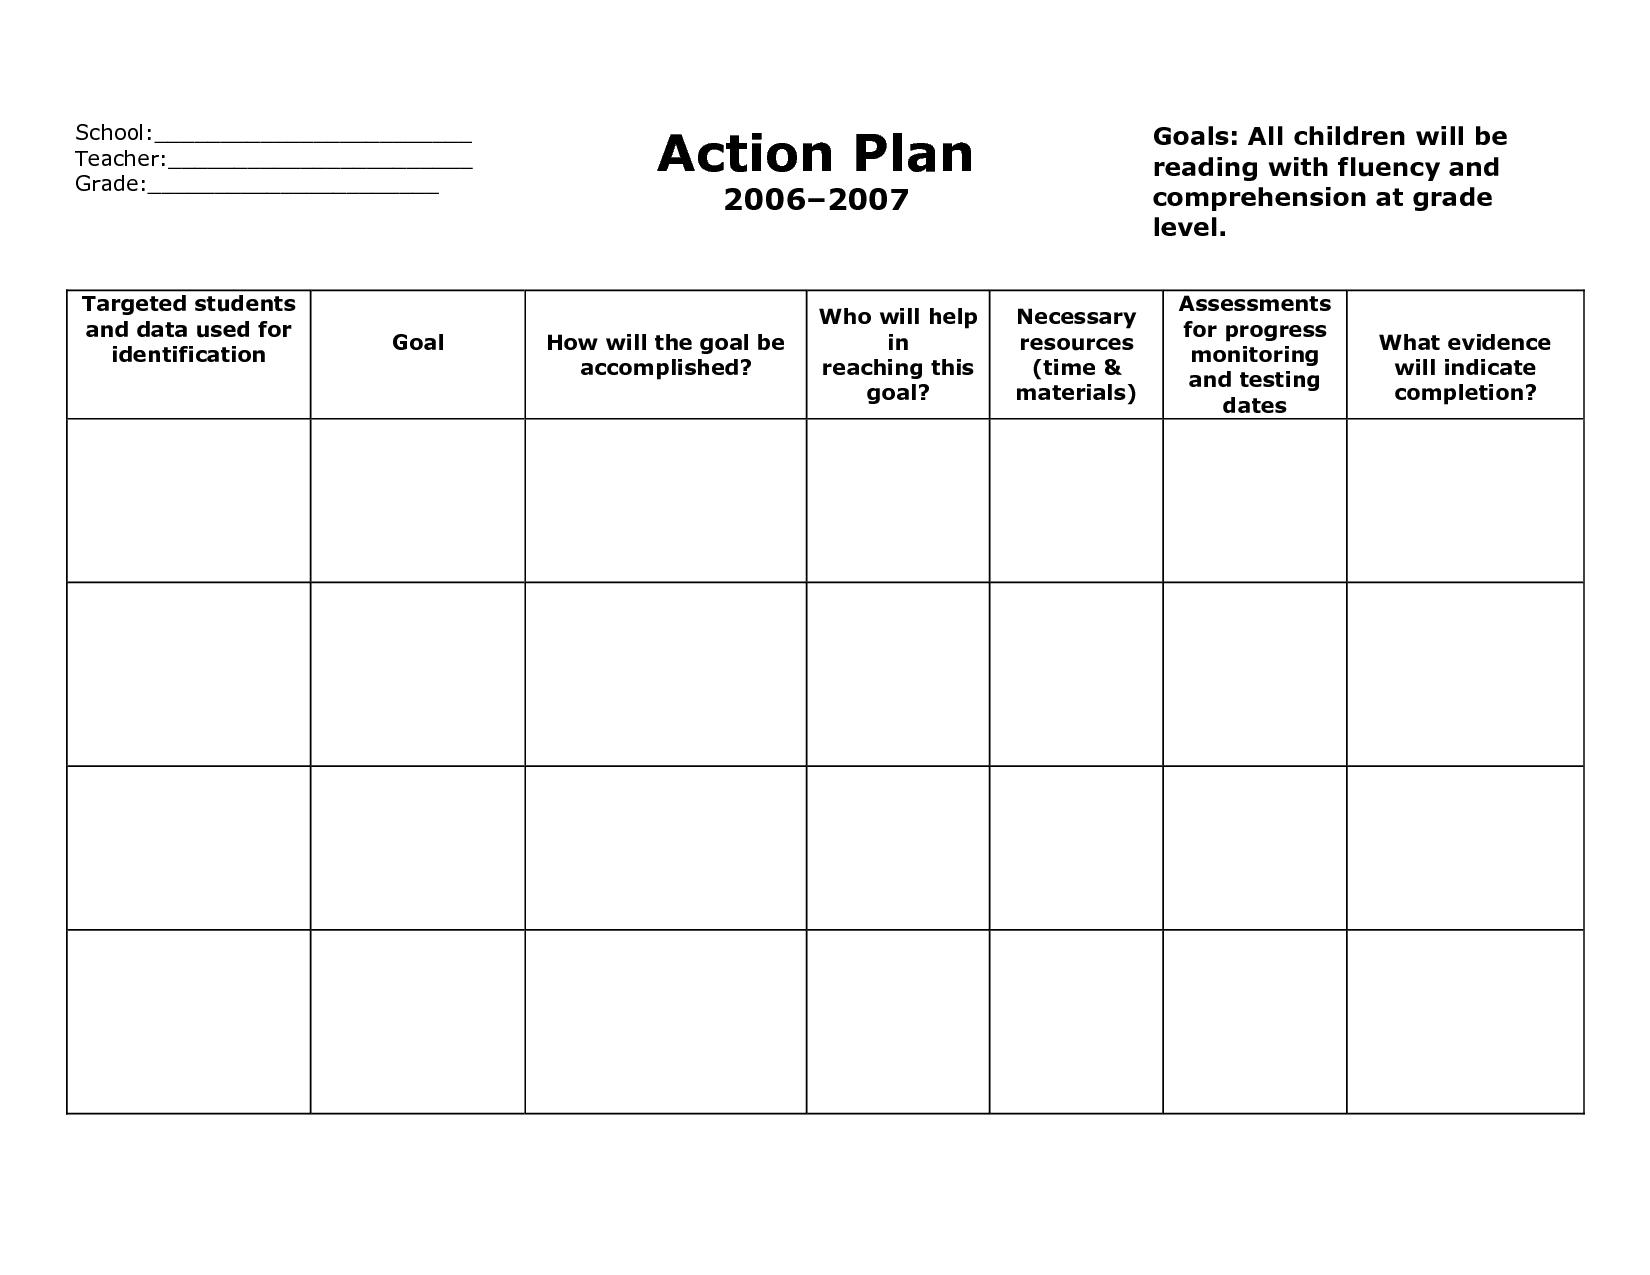 Weekly Plan Book Templates For Teachers | School Action Plan In Teacher Plan Book Template Word